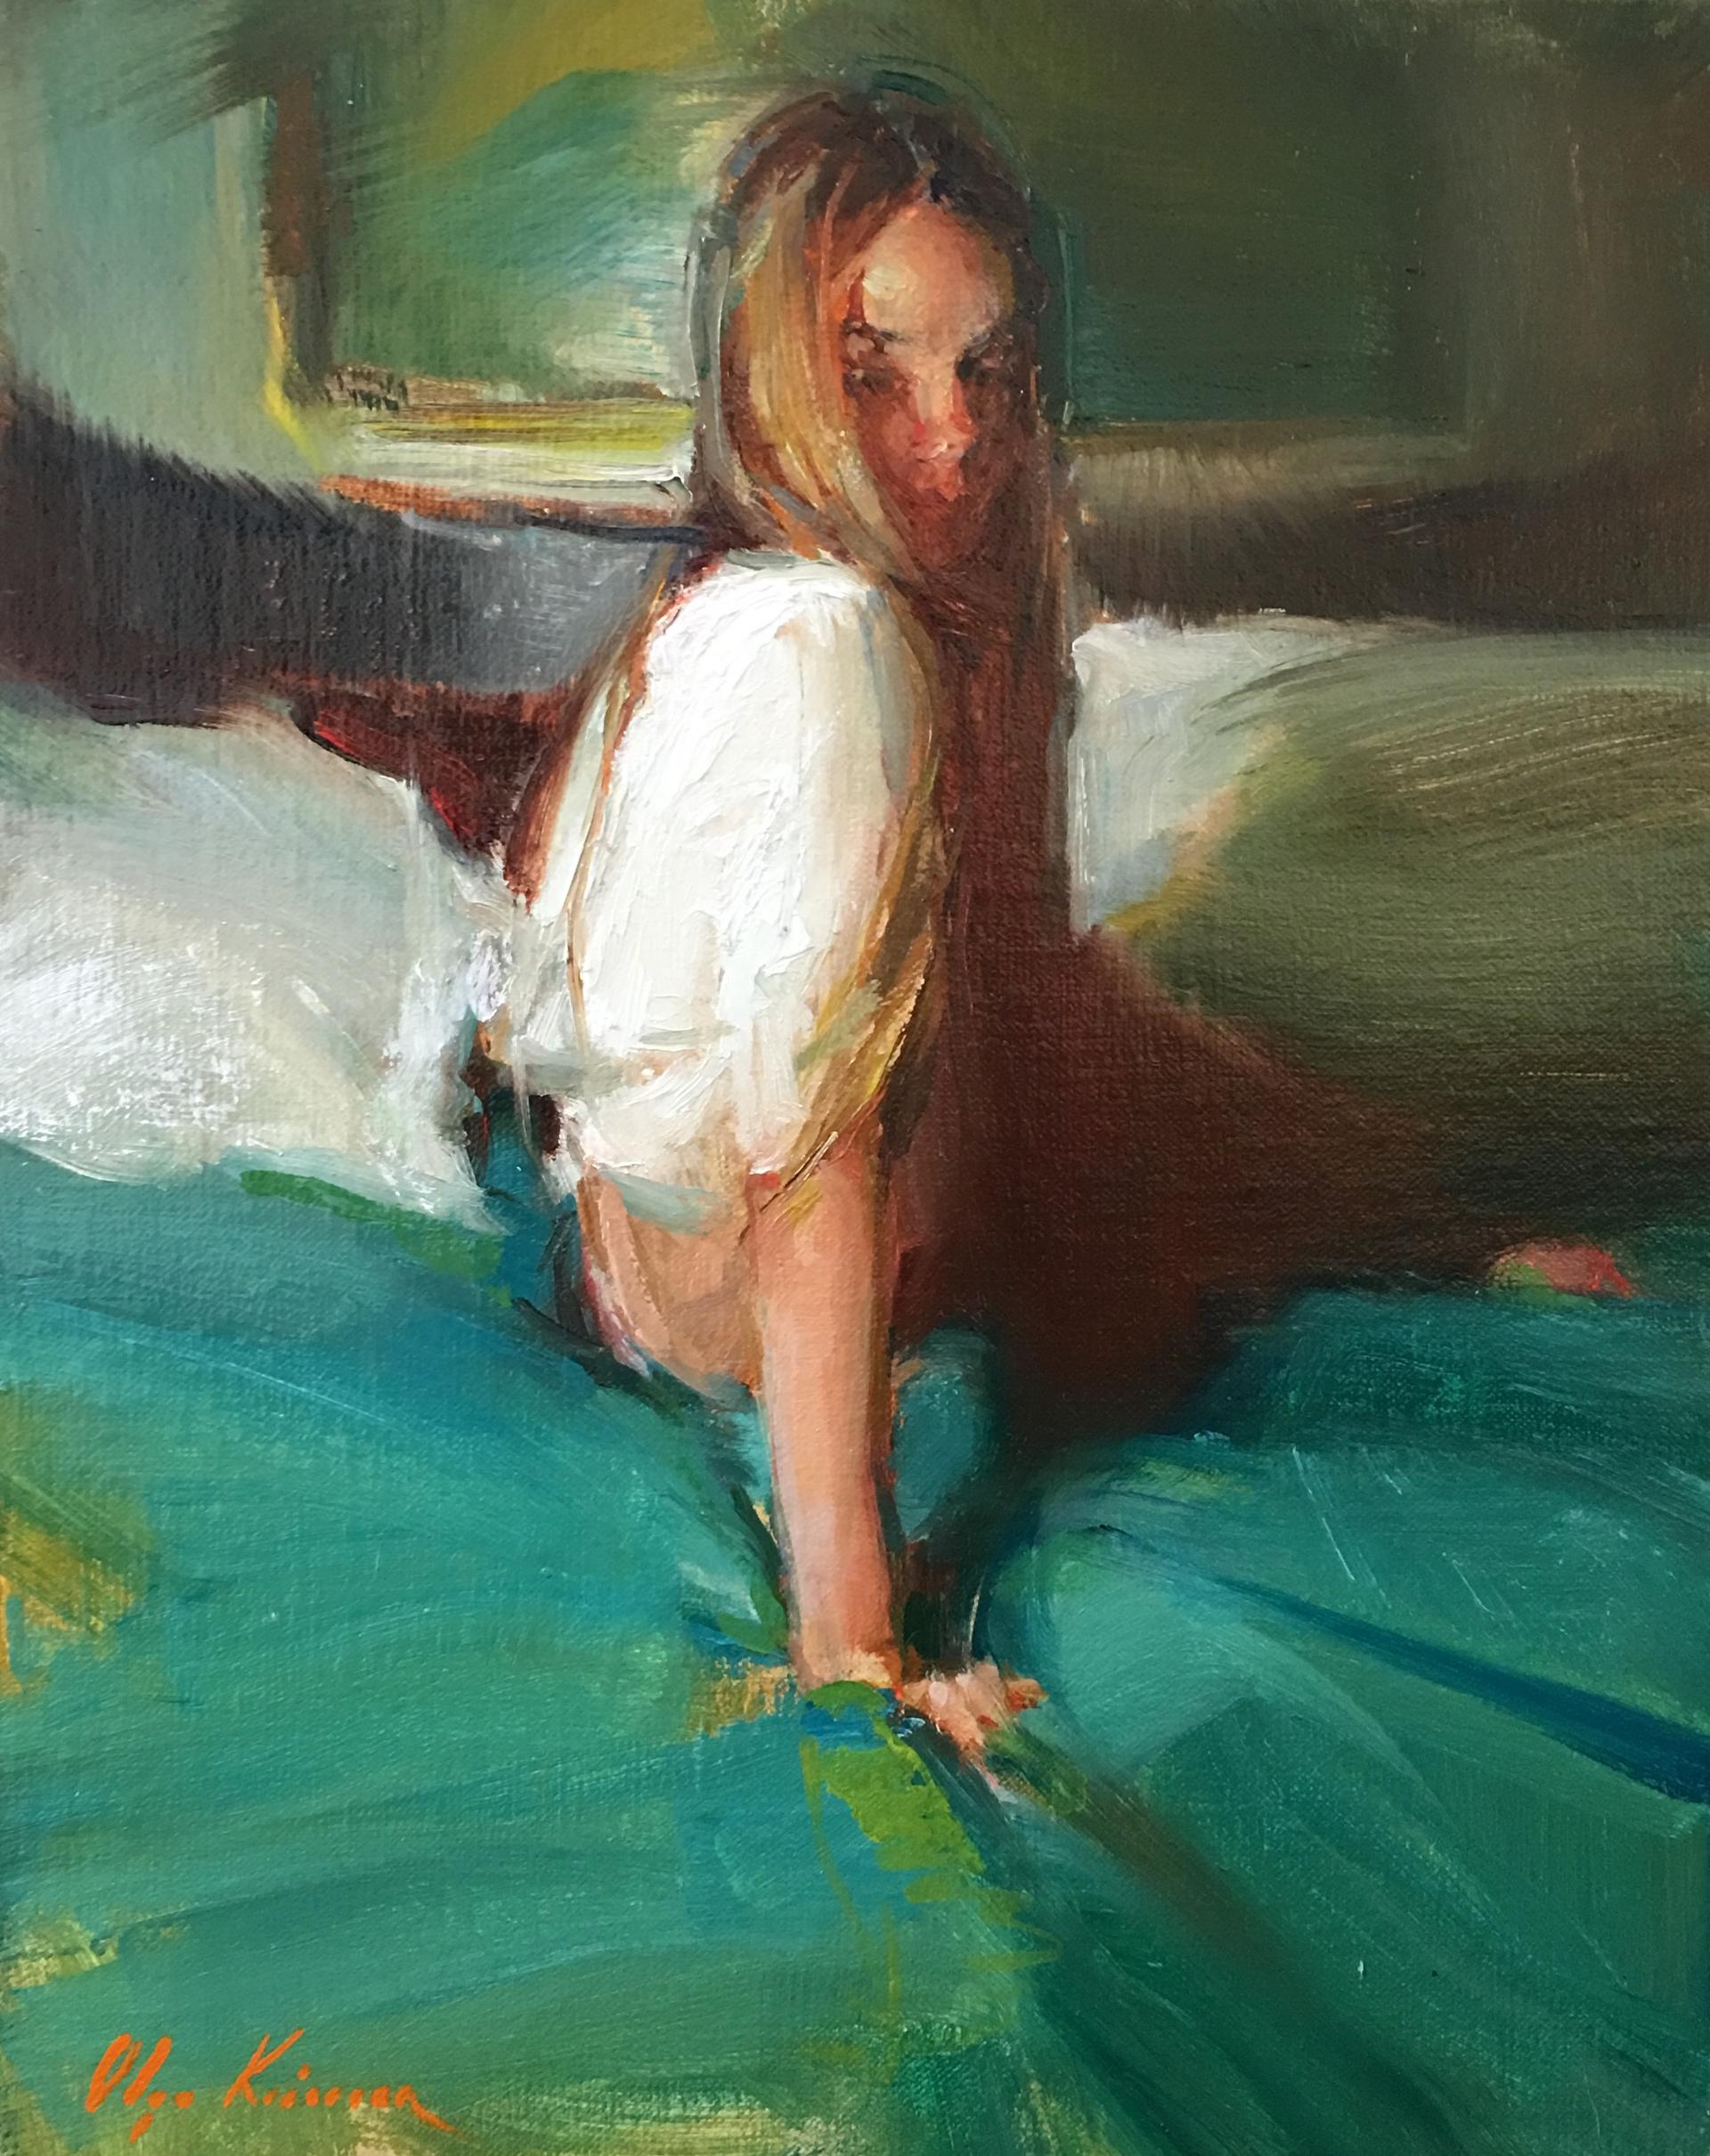 Askance by Olga Krimon